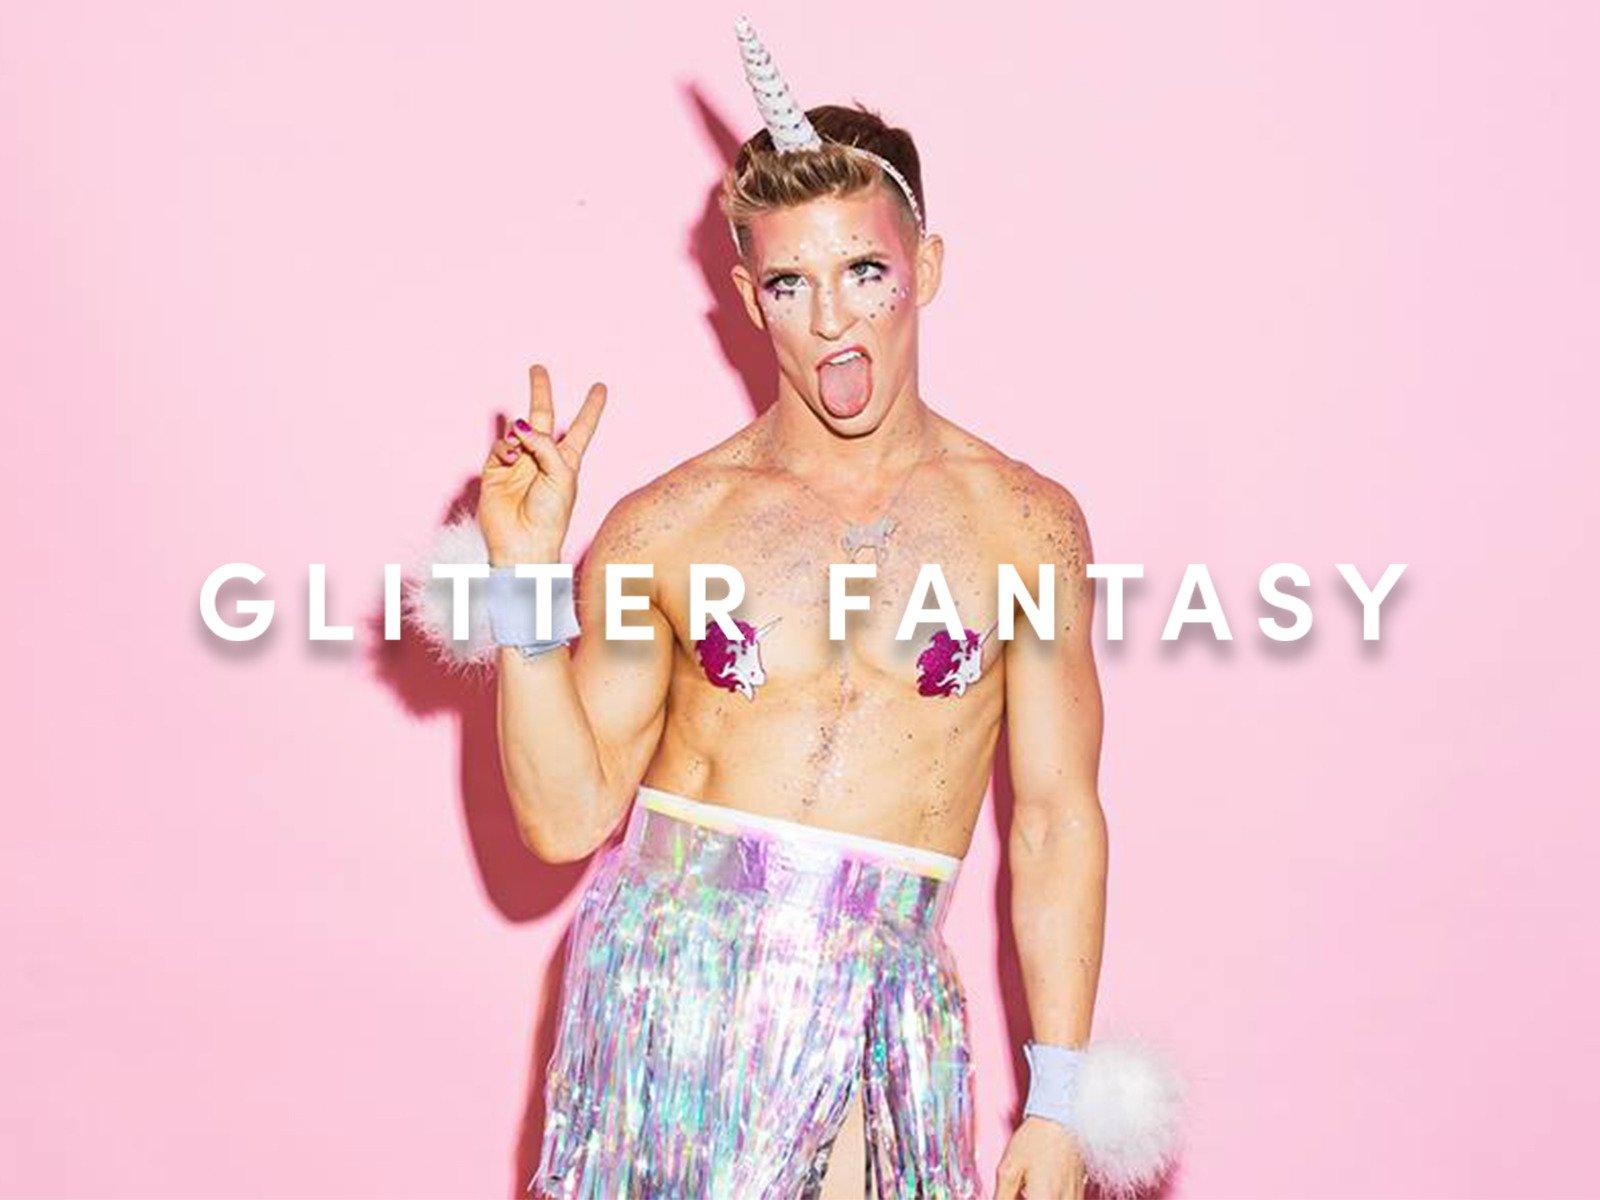 Glitter Fantasy - Season 1